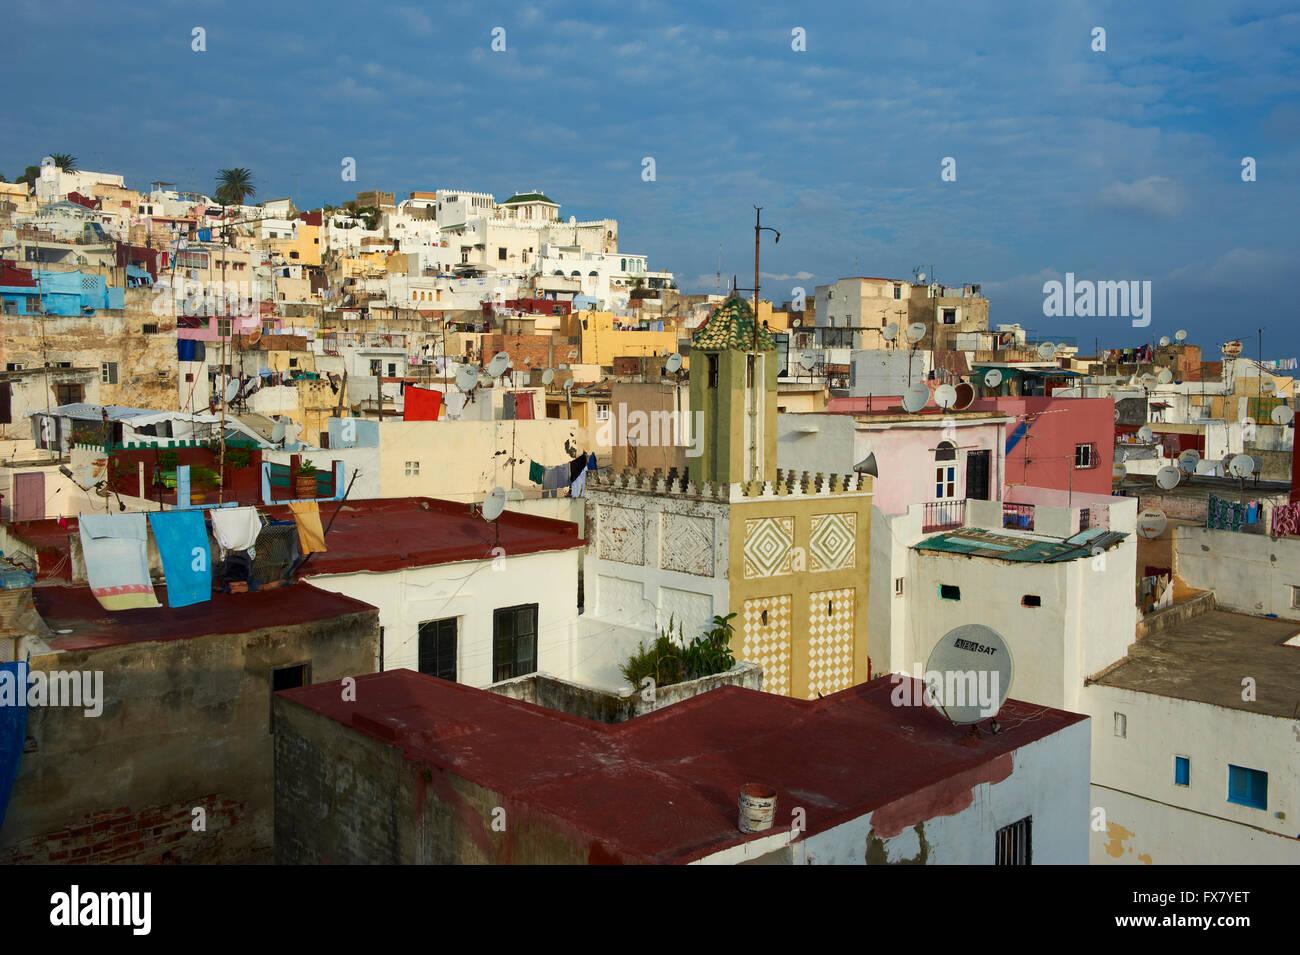 Maroc, Tanger, Medina, vieille ville Photo Stock